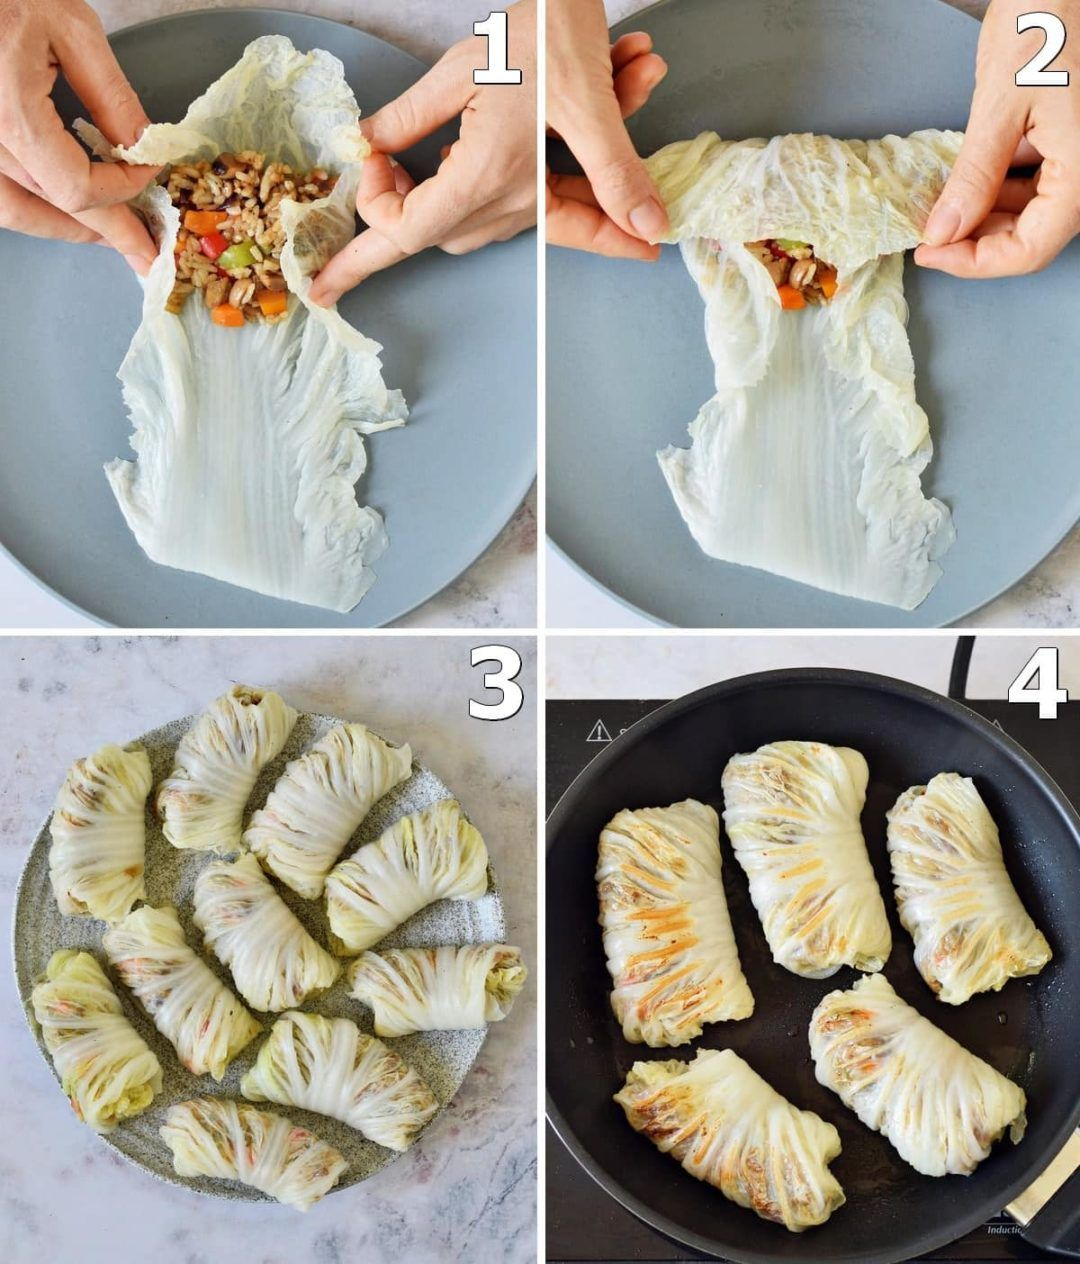 Vegan Cabbage Rolls | Asian-Inspired Wraps - Elave